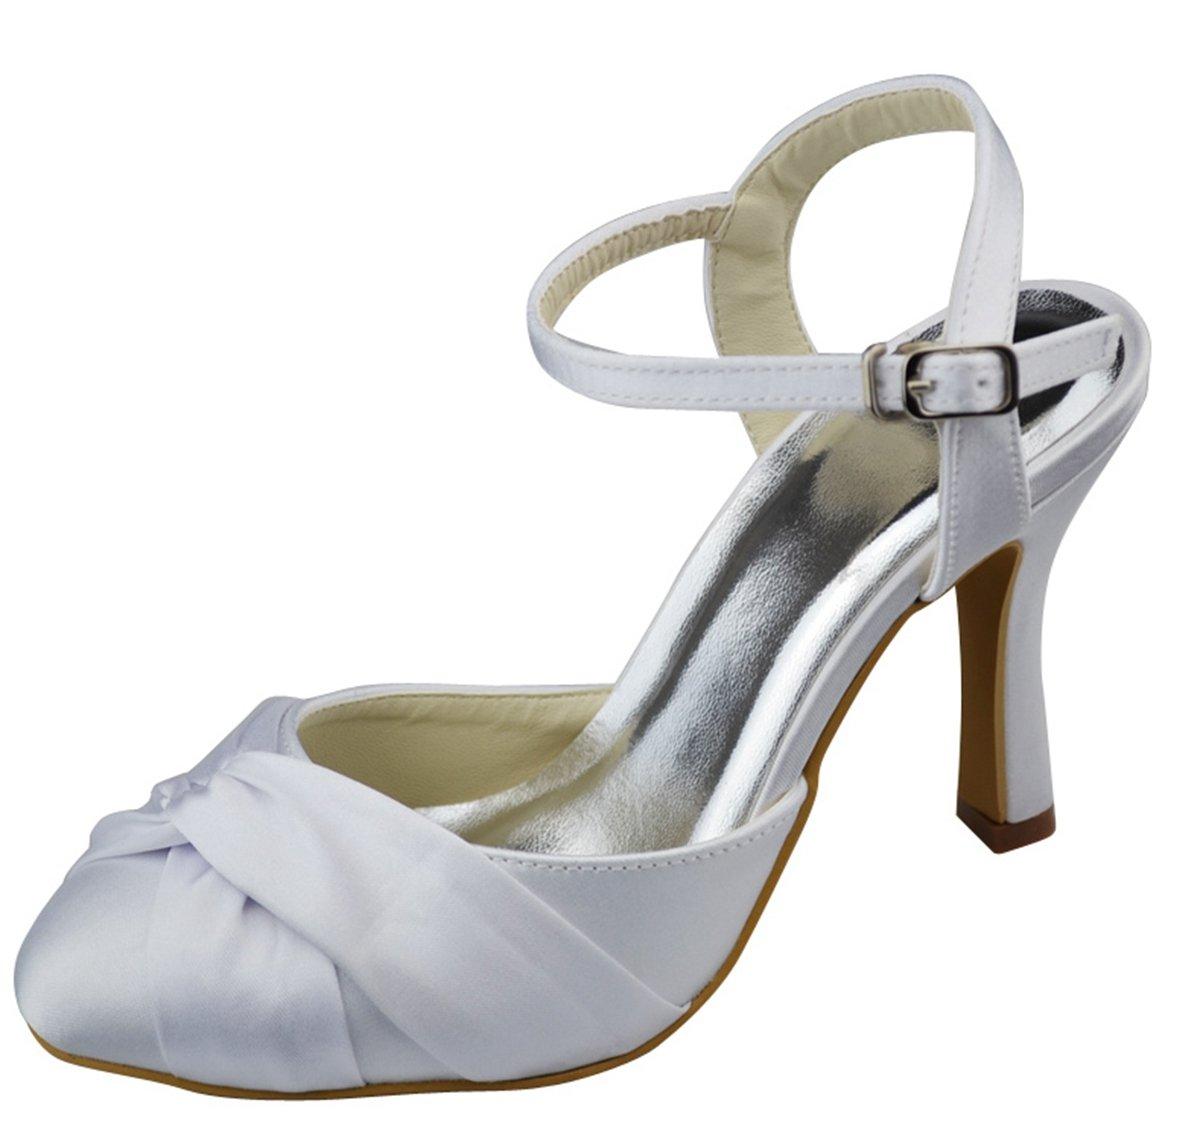 Minitoo , Bride , B07FY3ZSWV de cheville femme Beige - Beige ivoire 228b63b - shopssong.space